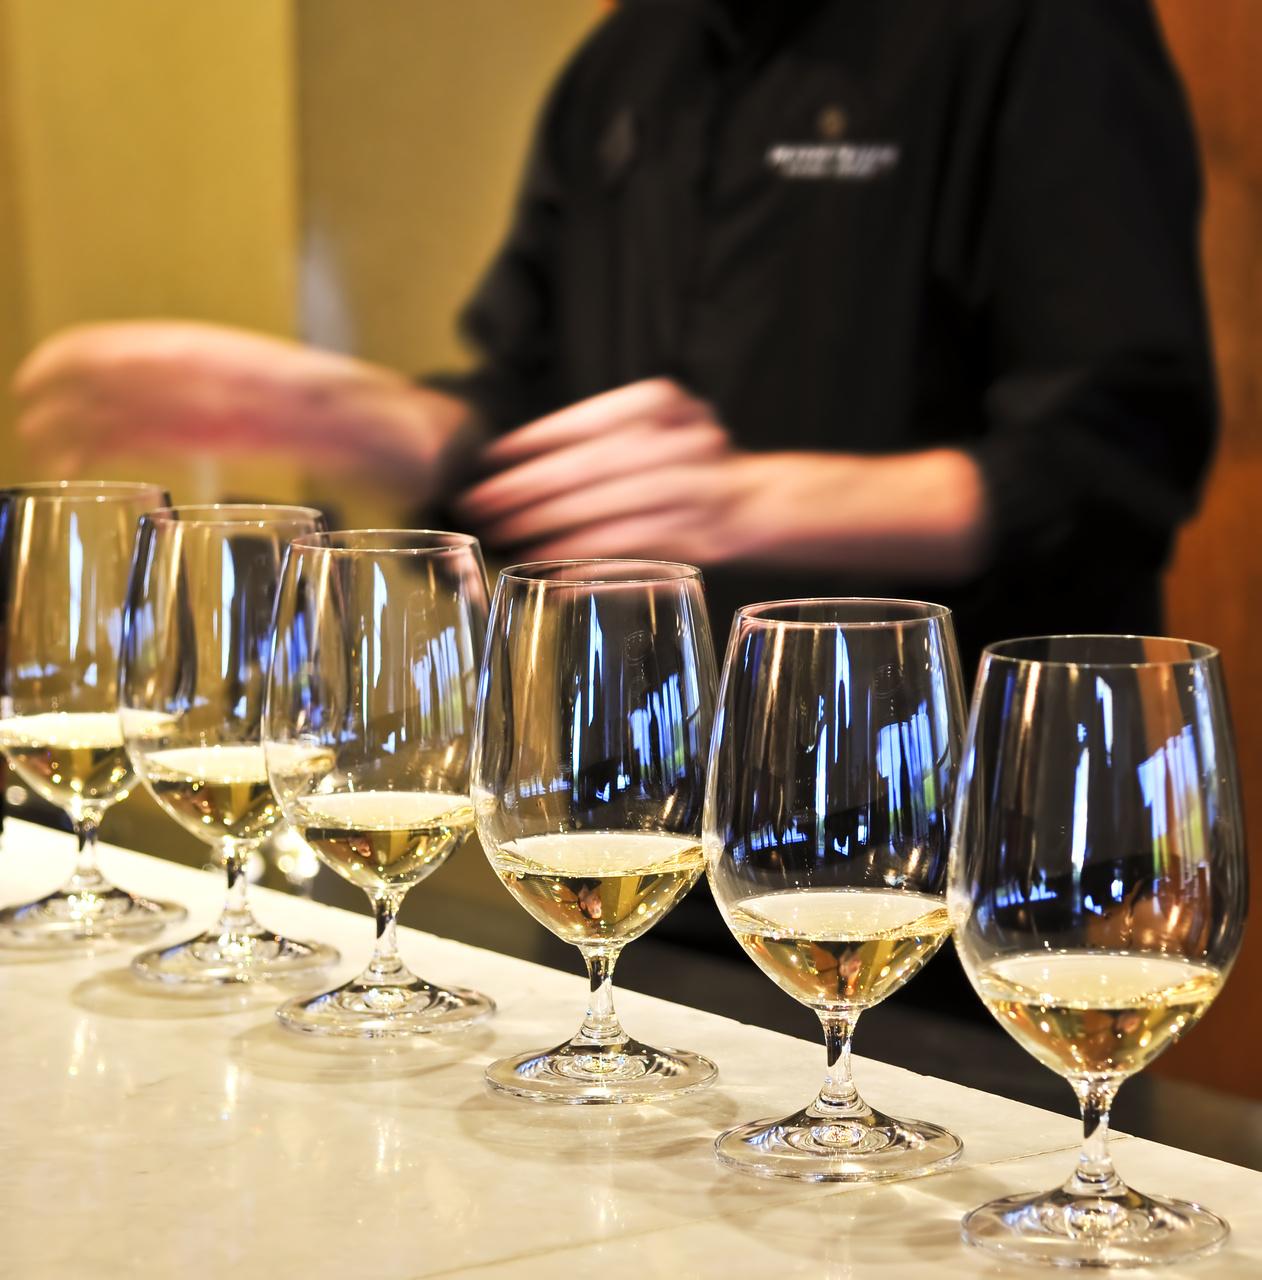 ORGANIZING A WINE TASTING03